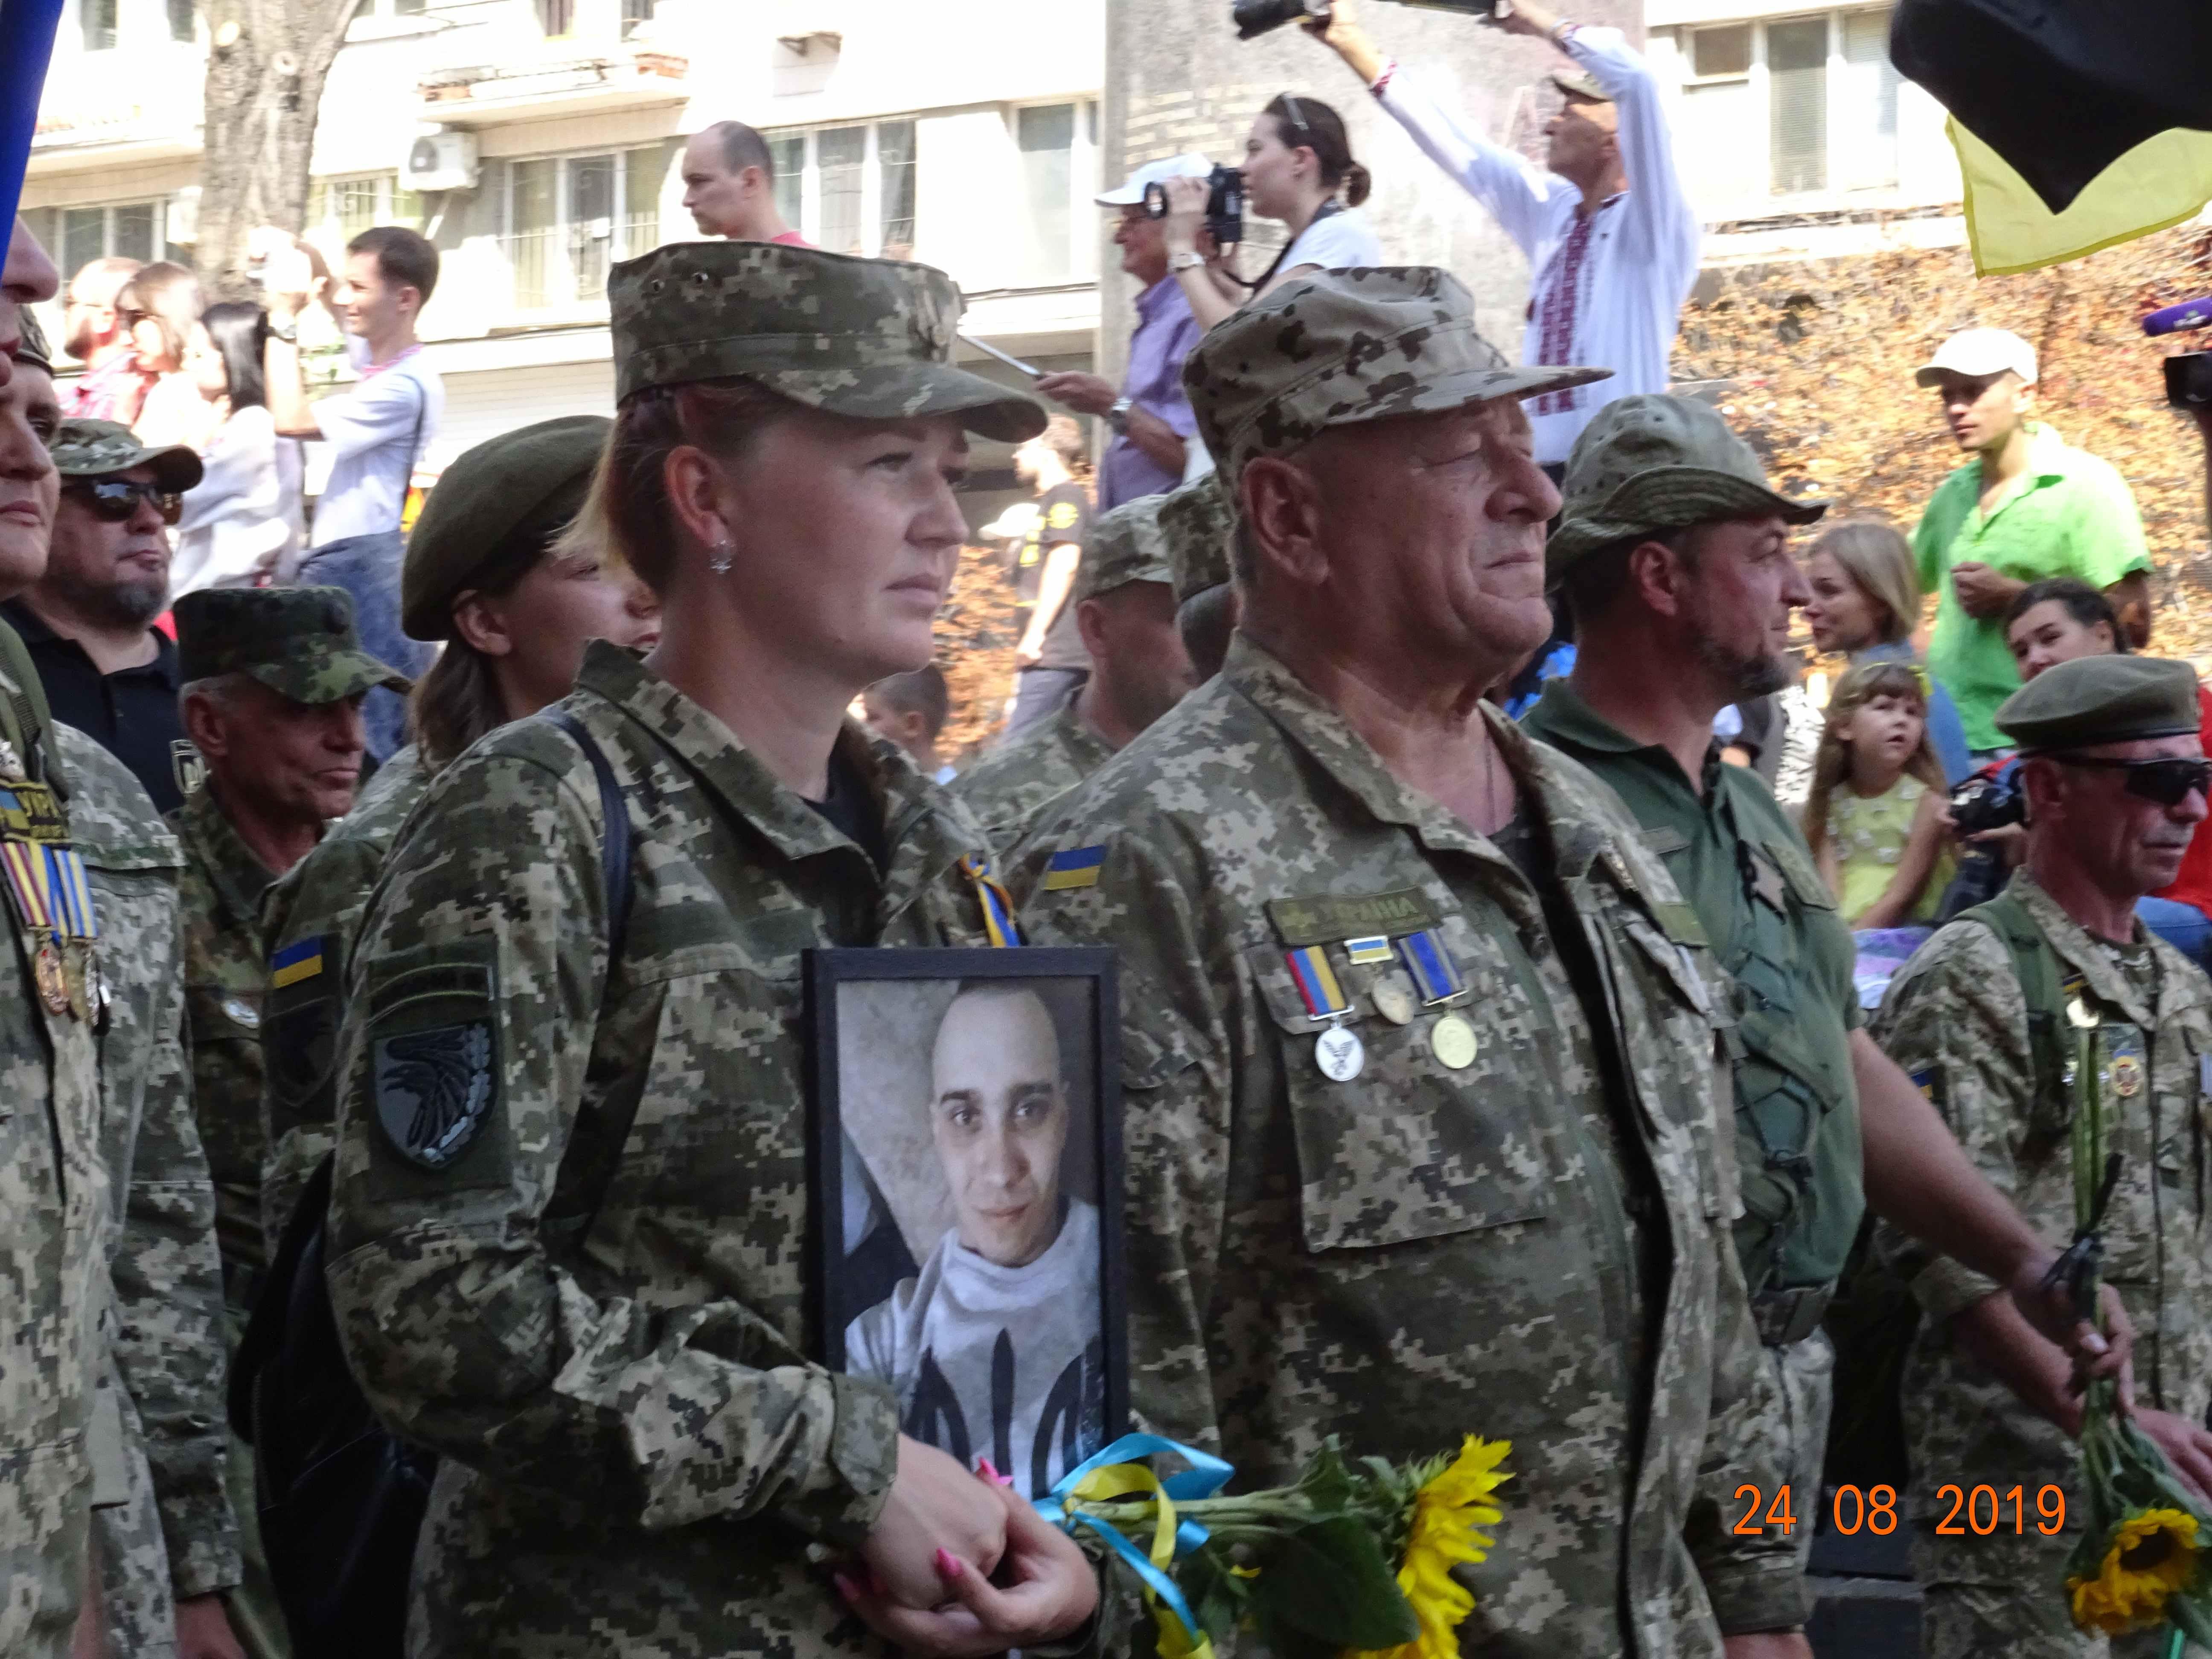 Defenders-of-Ukraine-Parad-24.Aug.19 - DSC06149.jpg